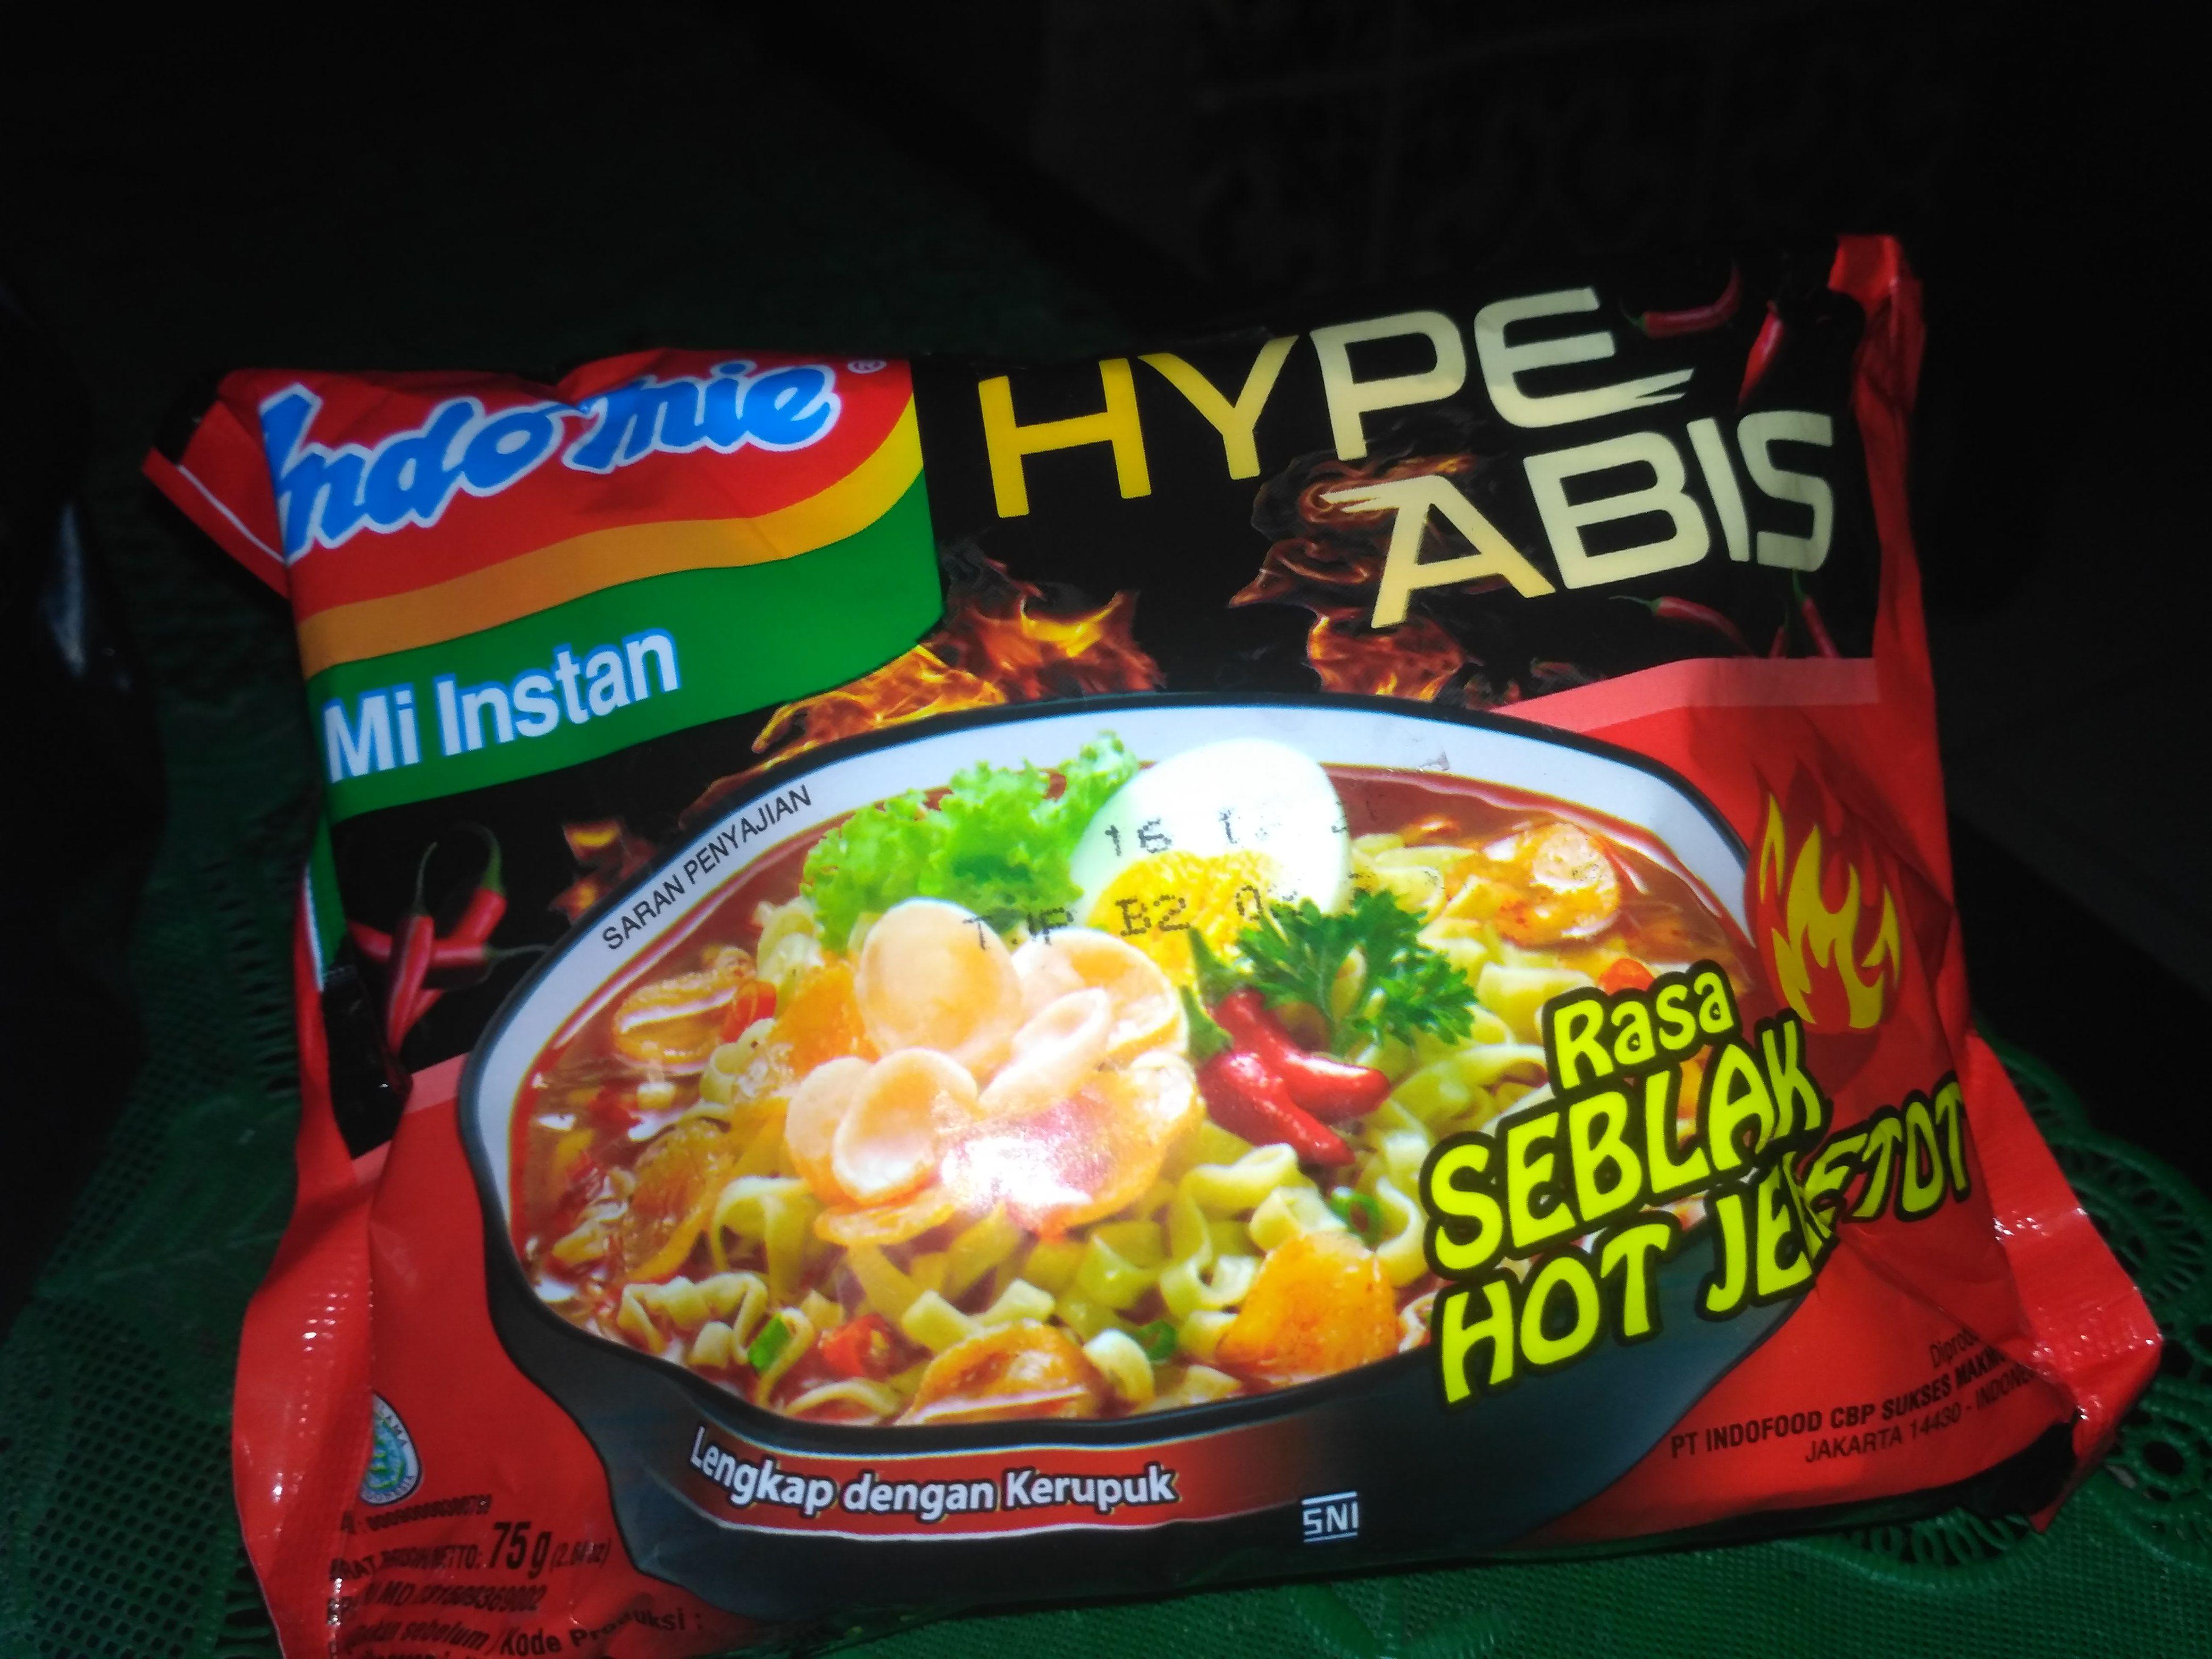 Indomie Hype Abis Seblak Hot Jeletot